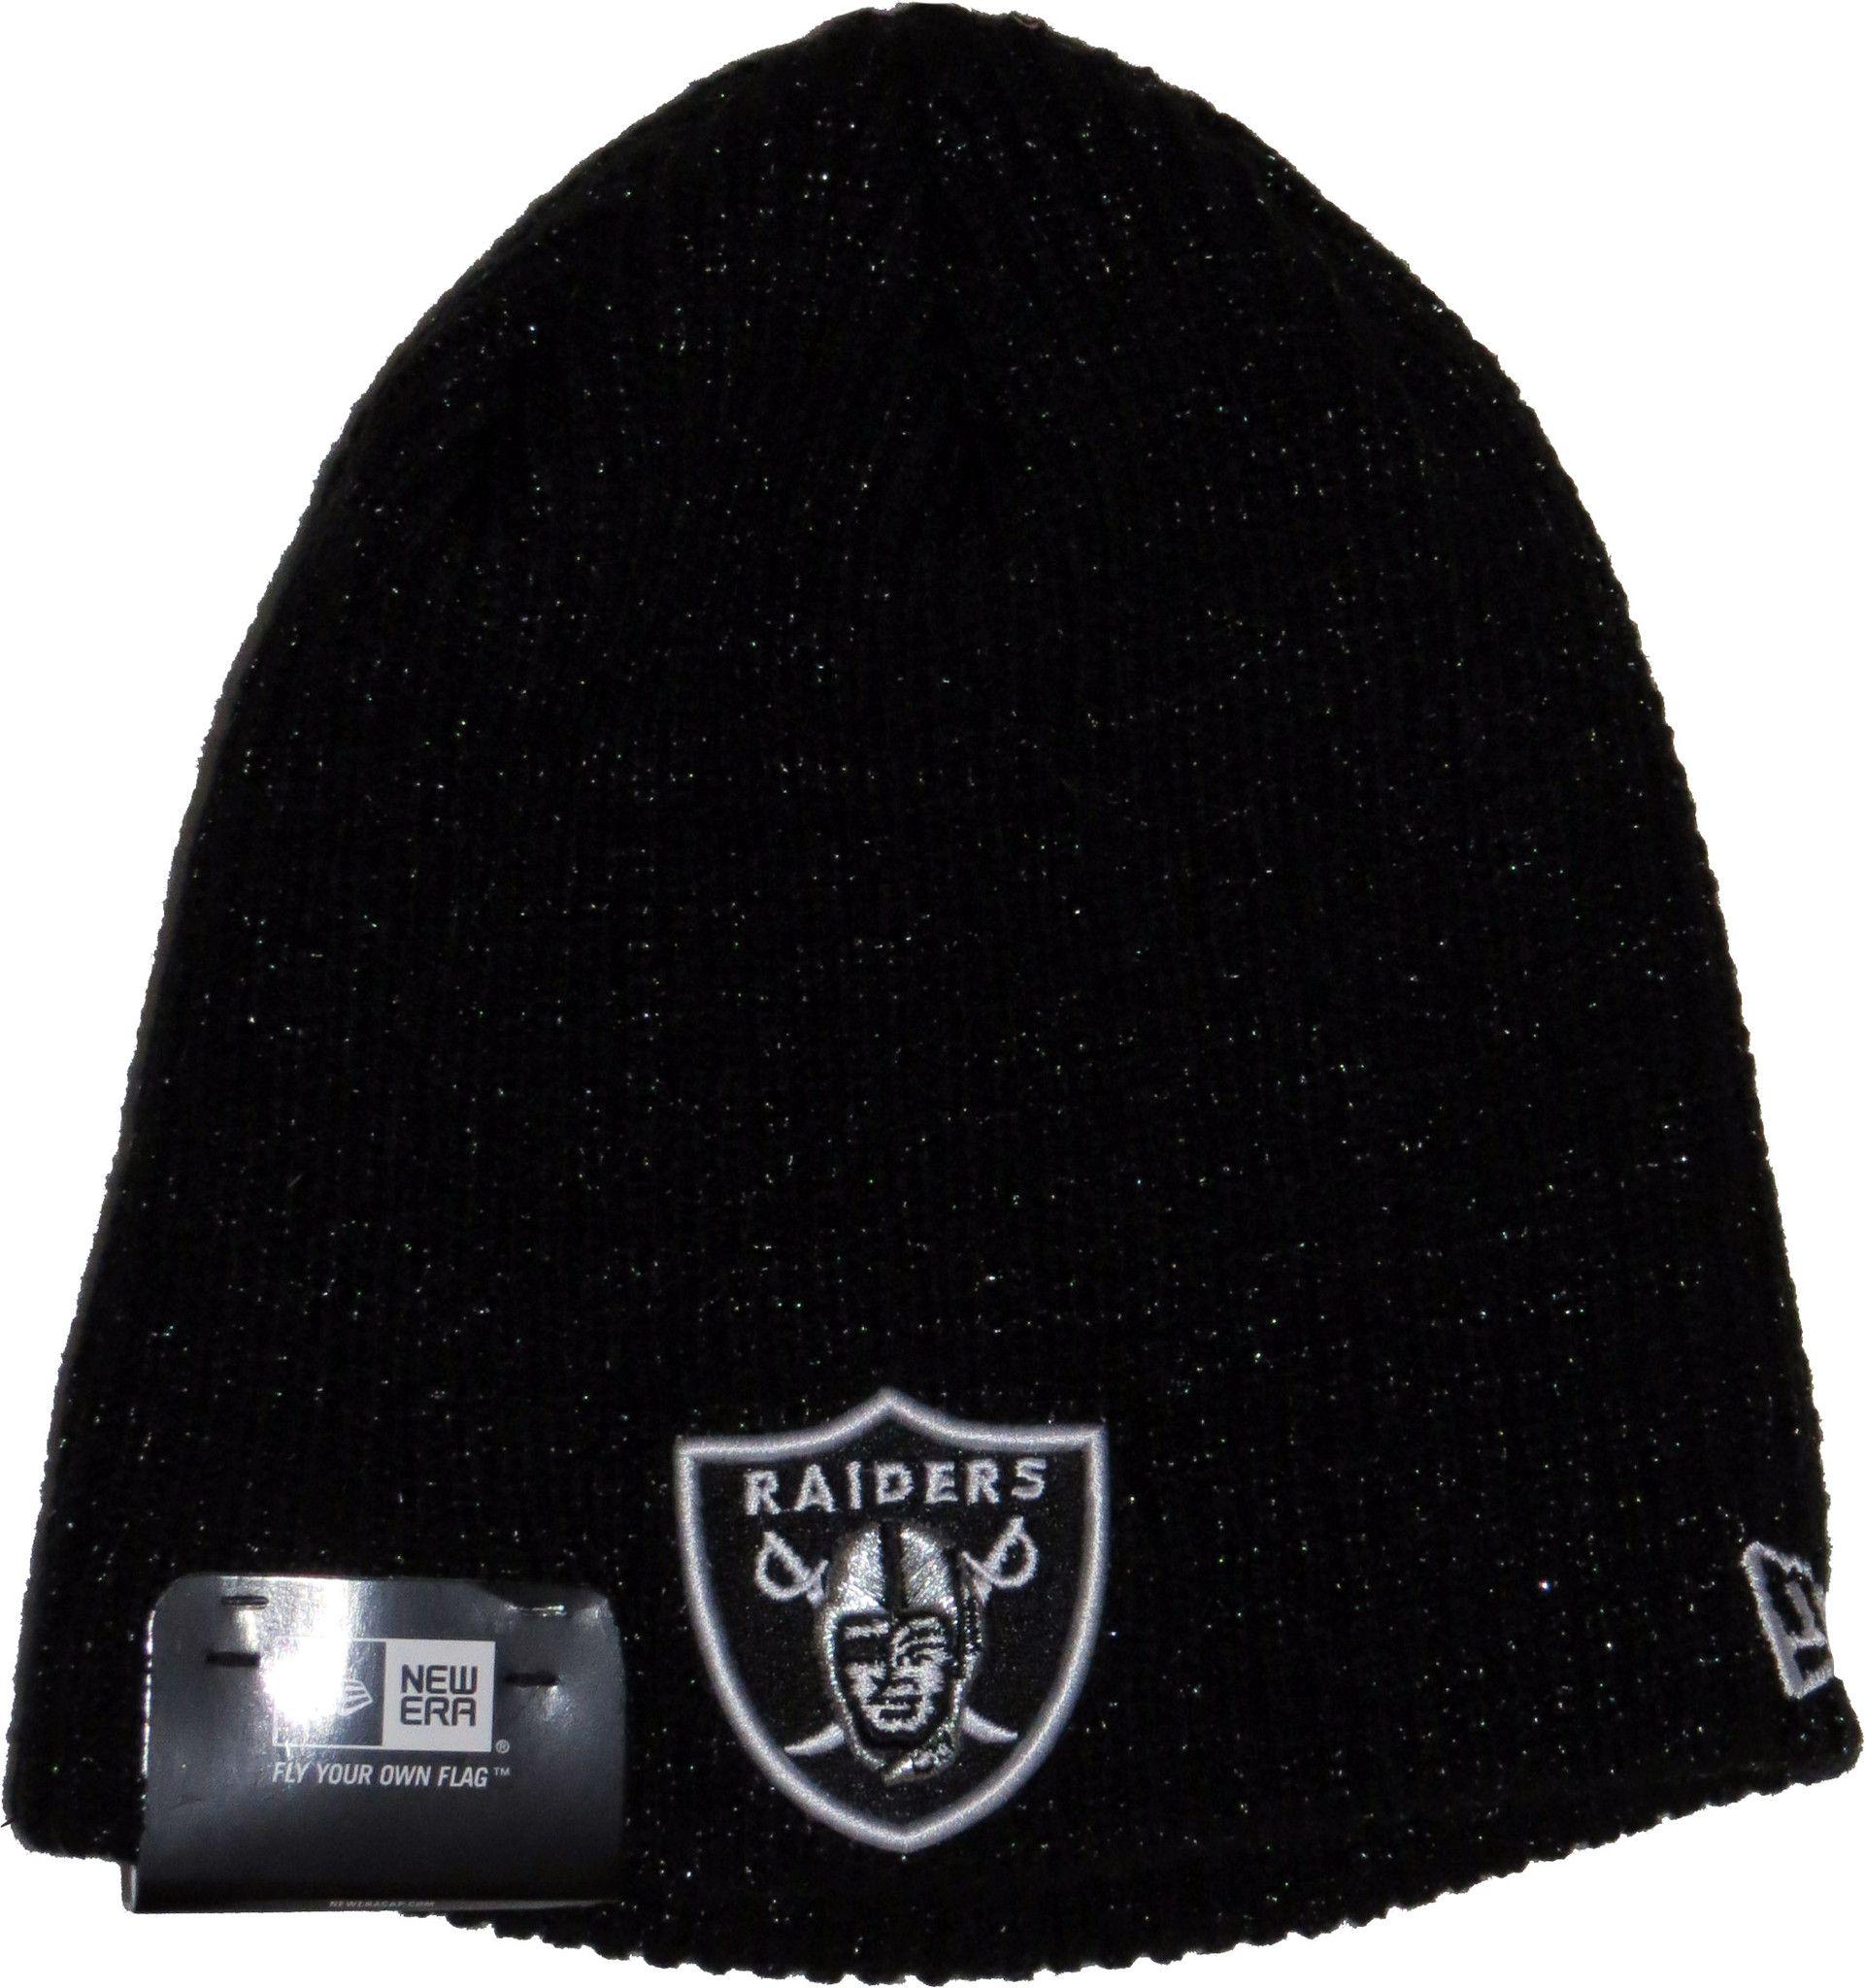 1c8c76fe Oakland Raiders New Era NFL Toned Black Beanie | Christmas Time ...